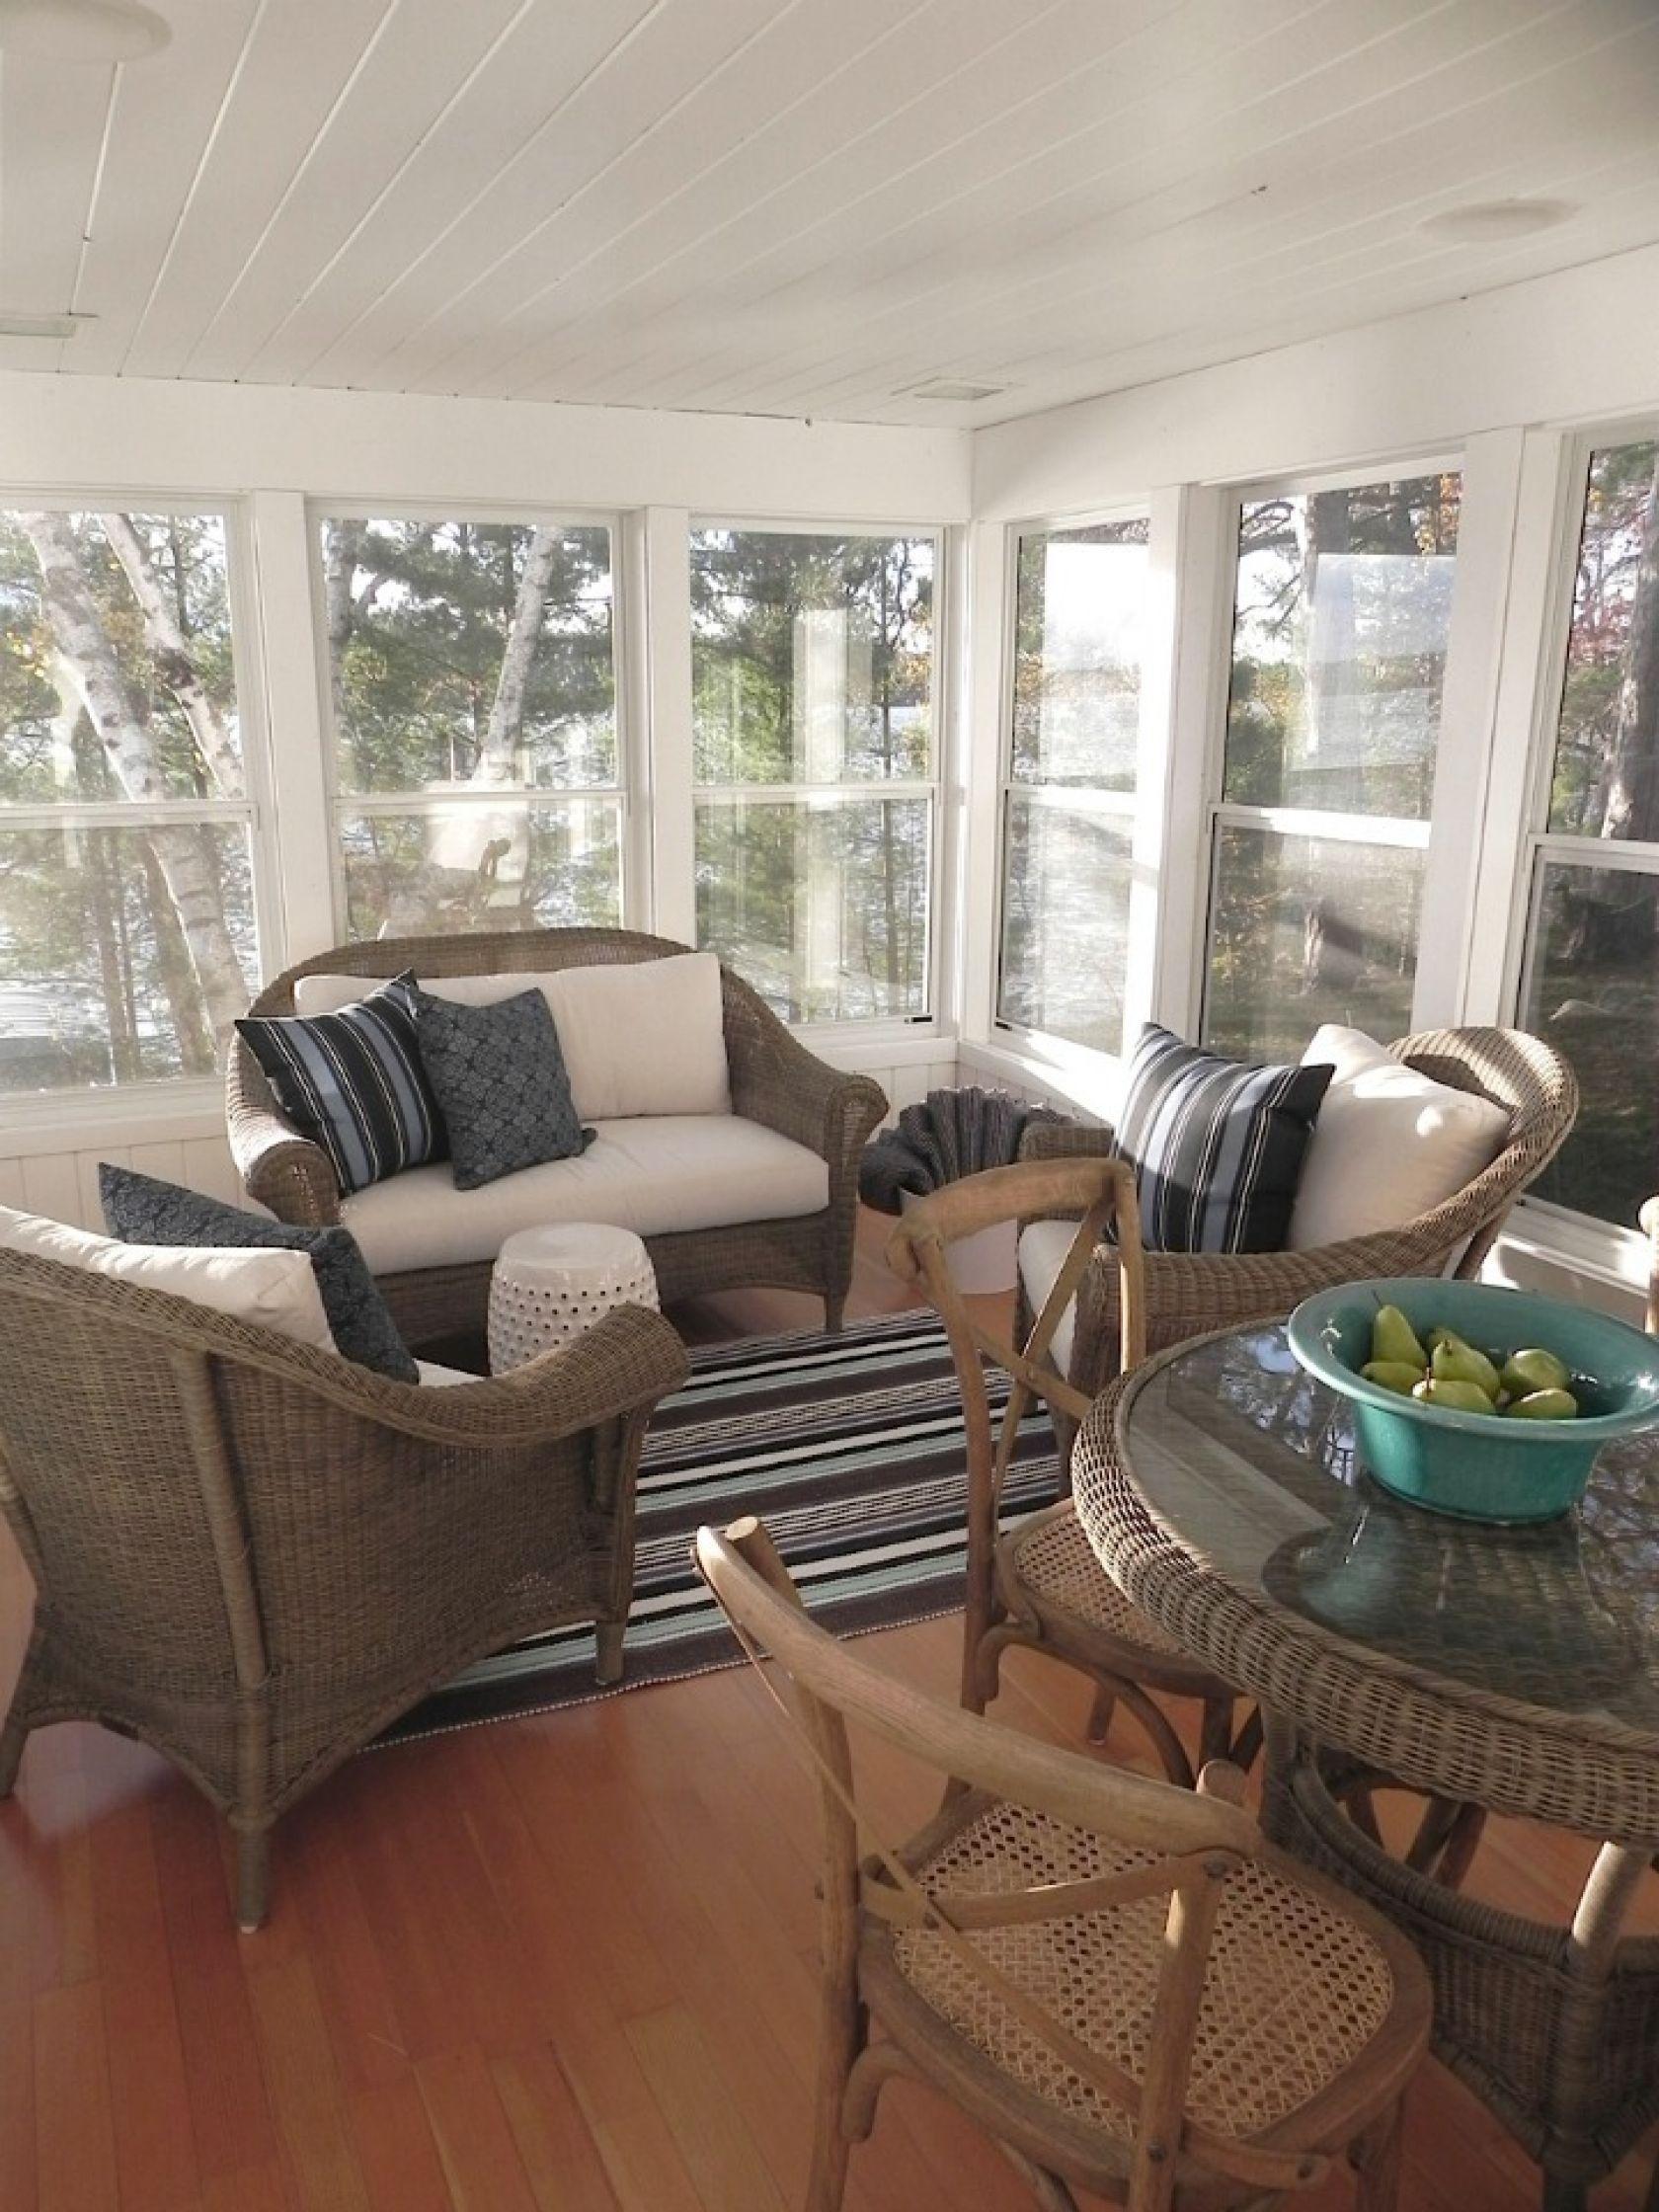 coastal cottage patio with wicker